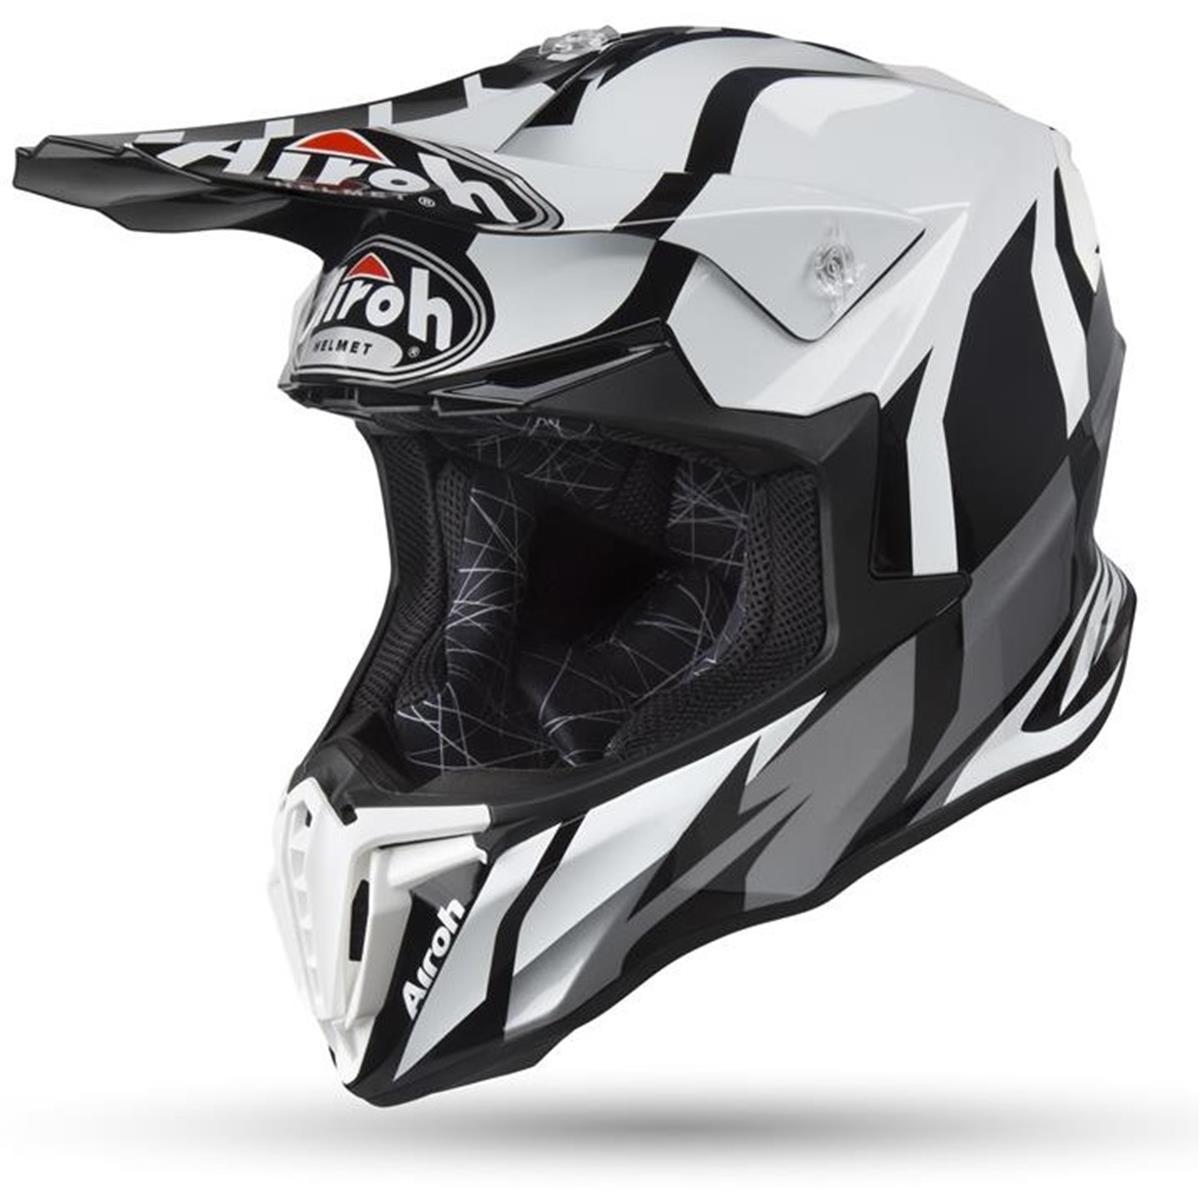 Airoh Helm Twist Great - Grau Gloss